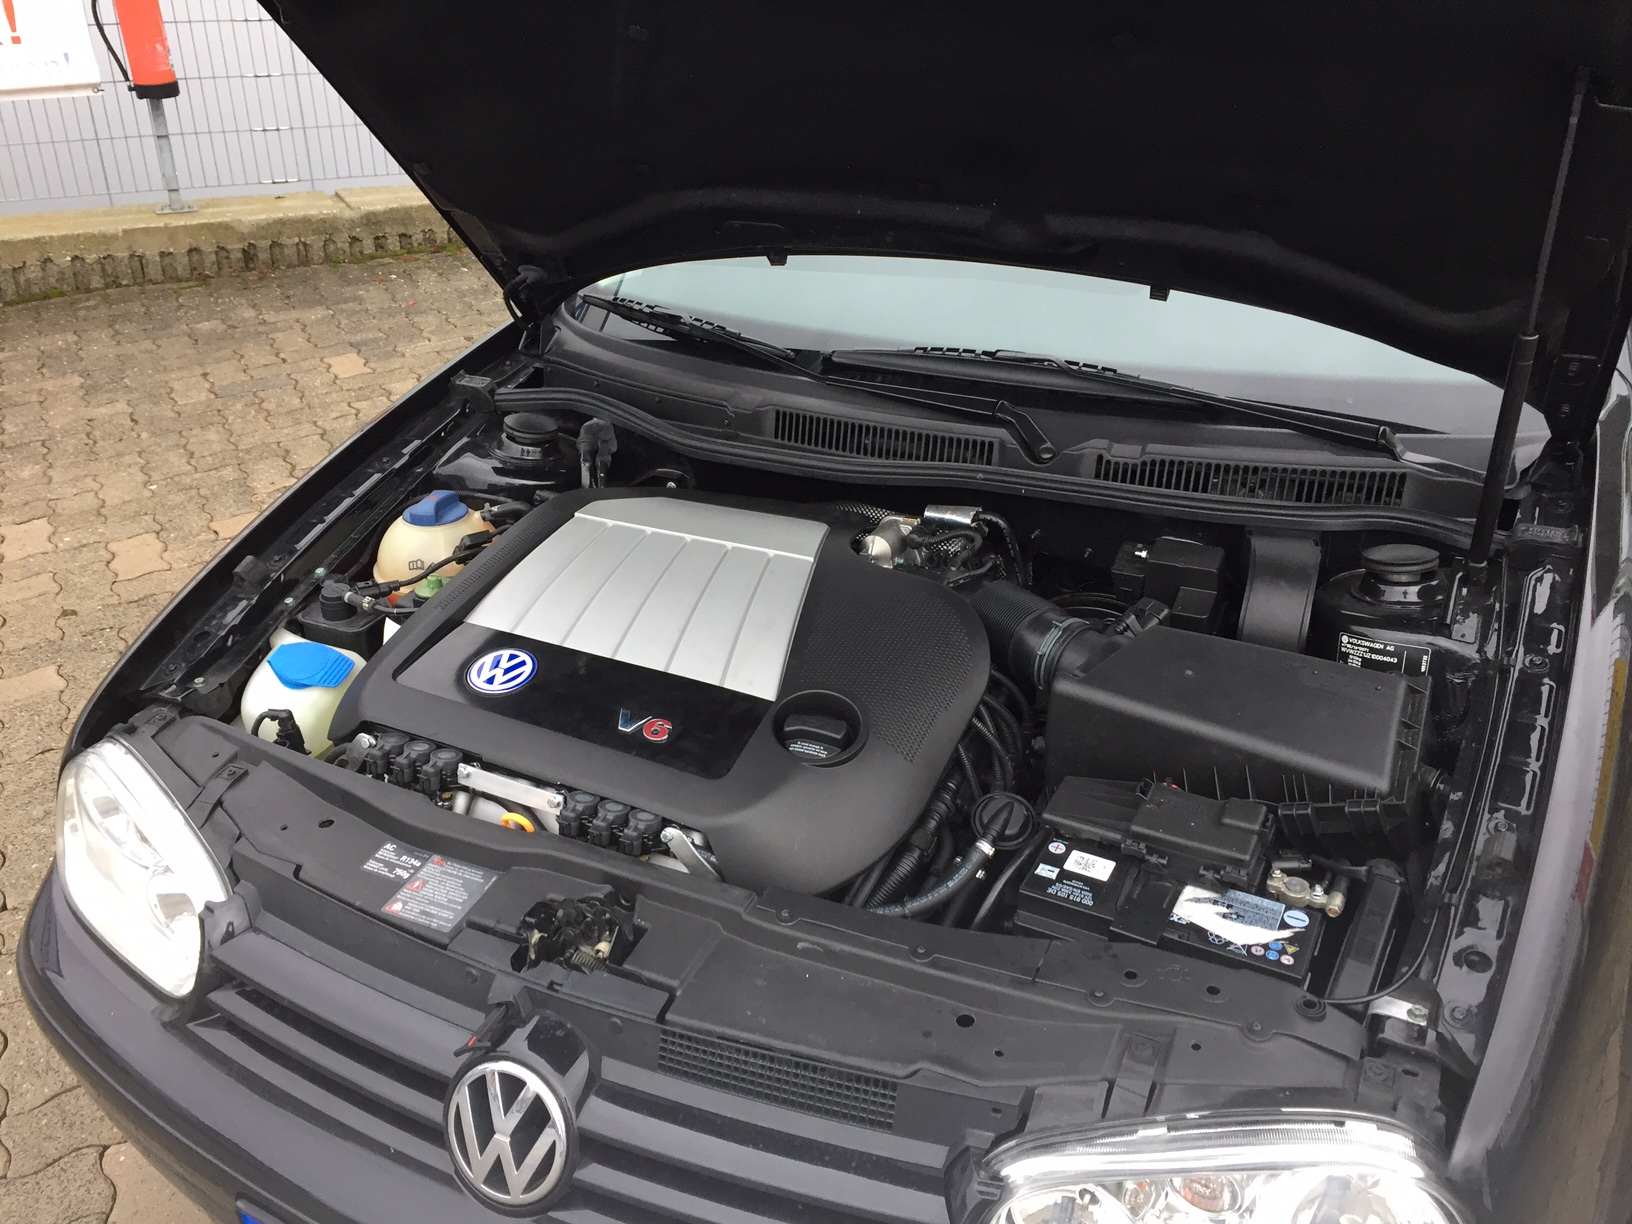 Autogas-Umrüstung-LPG-Frontgas-VW-Golf-4-2,8-150kw-03